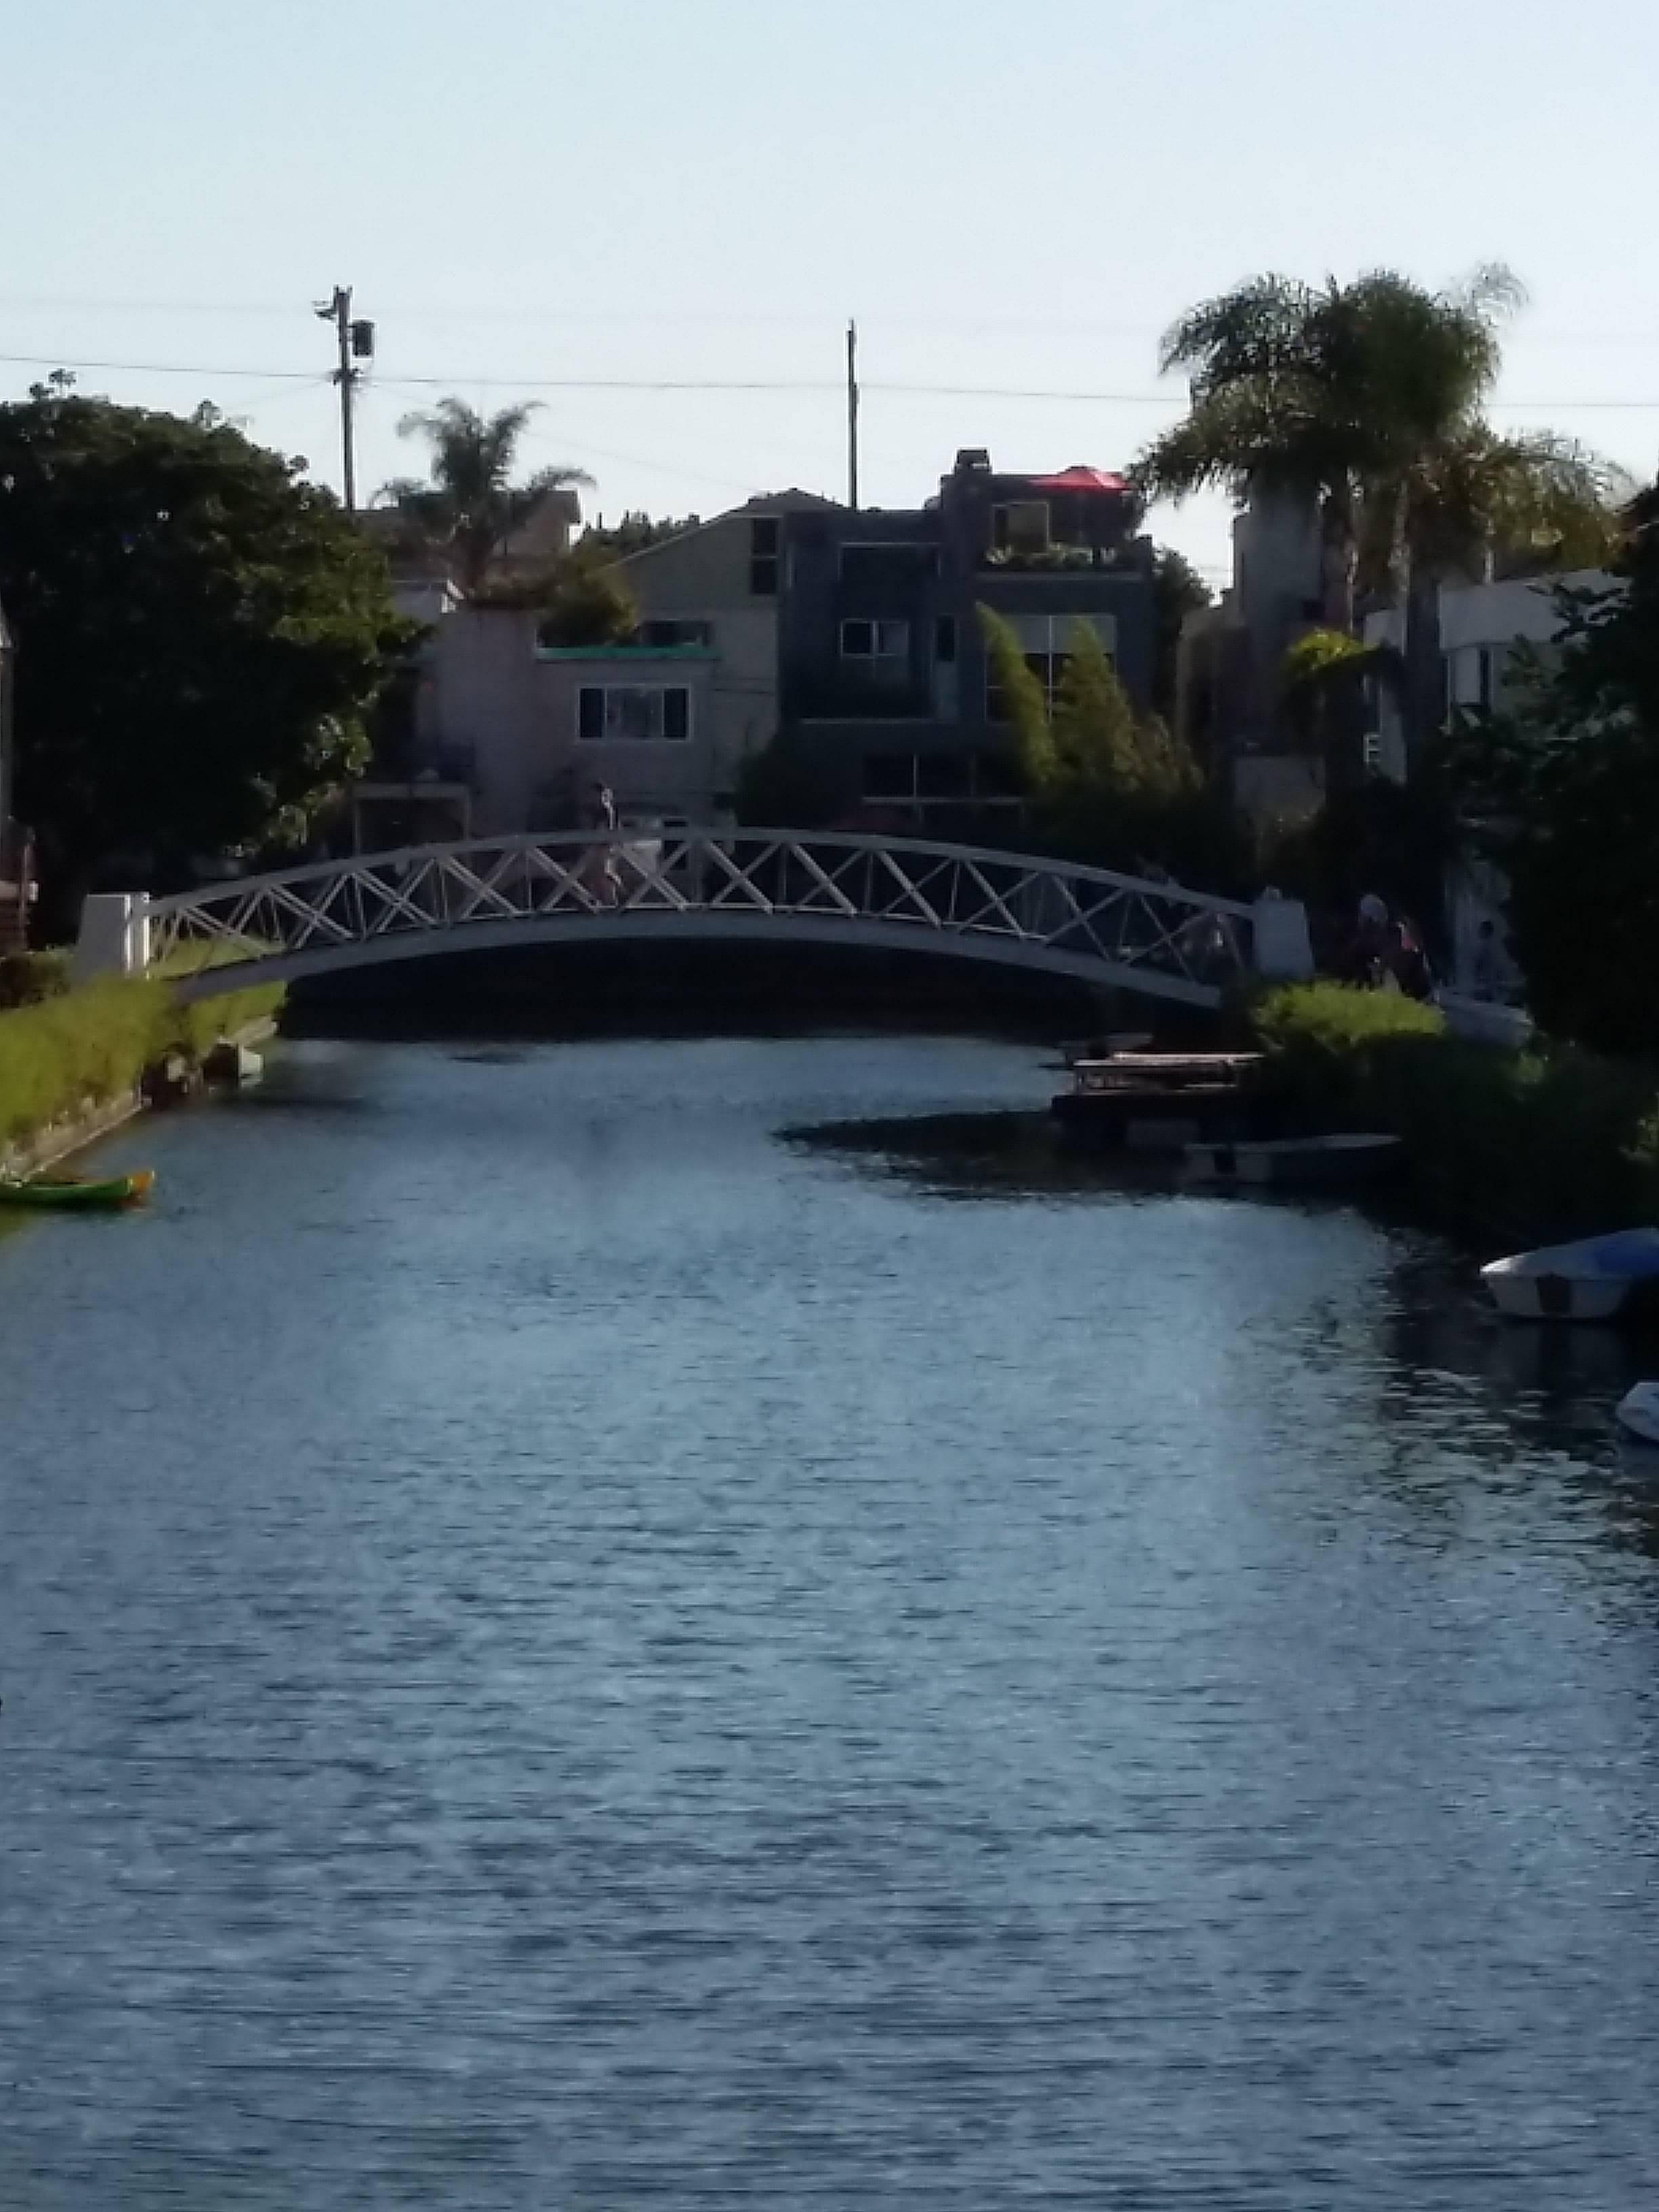 Photo 3: De Santa Monica à Venice beach en Vélo